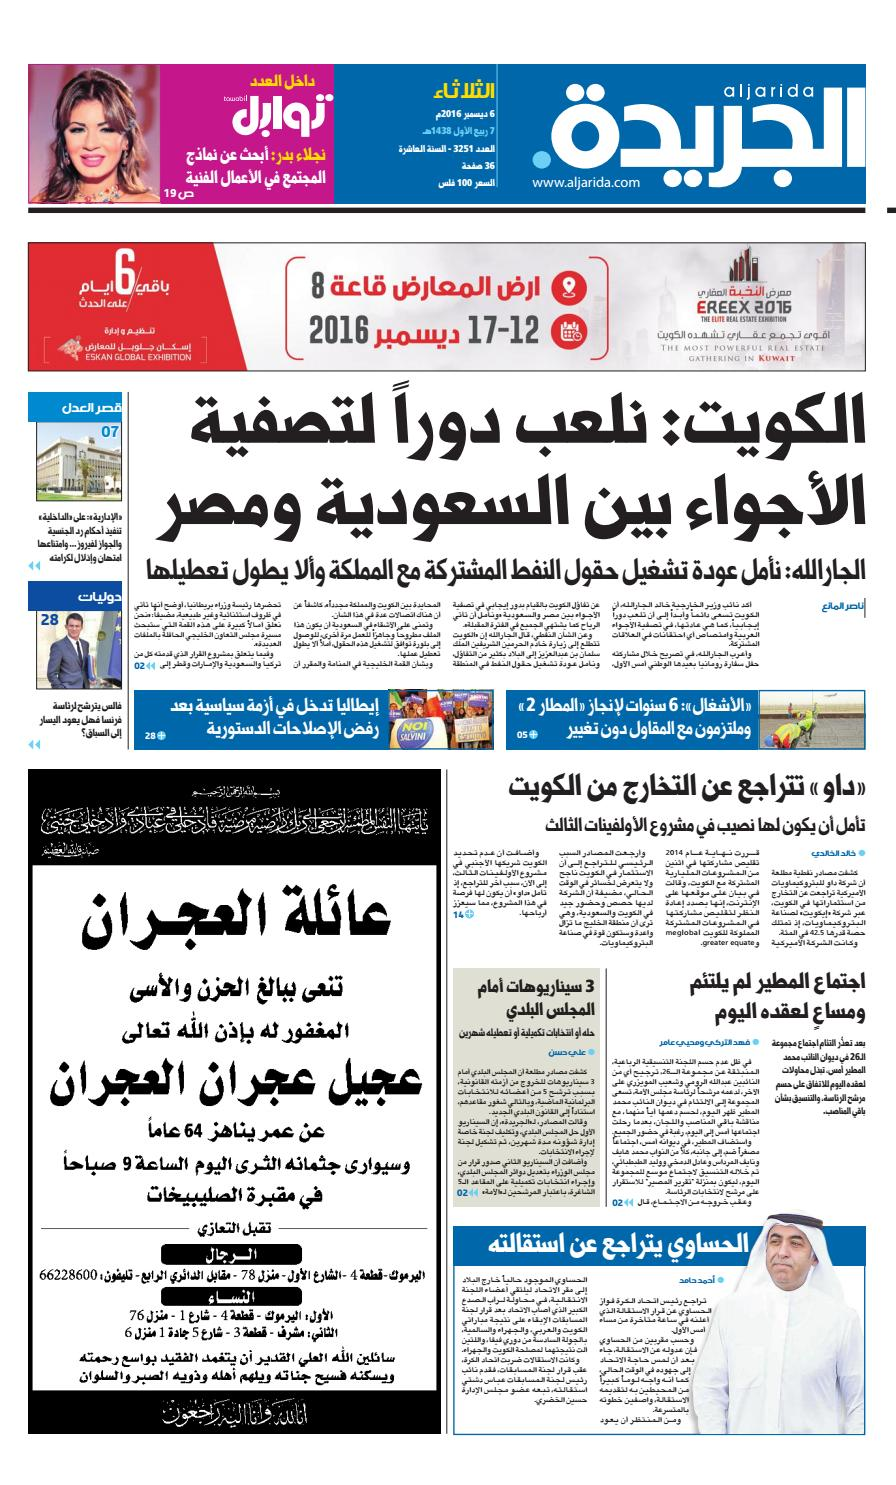 bdbf2a901 عدد الجريدة 06 ديسمبر 2016 by Aljarida Newspaper - issuu